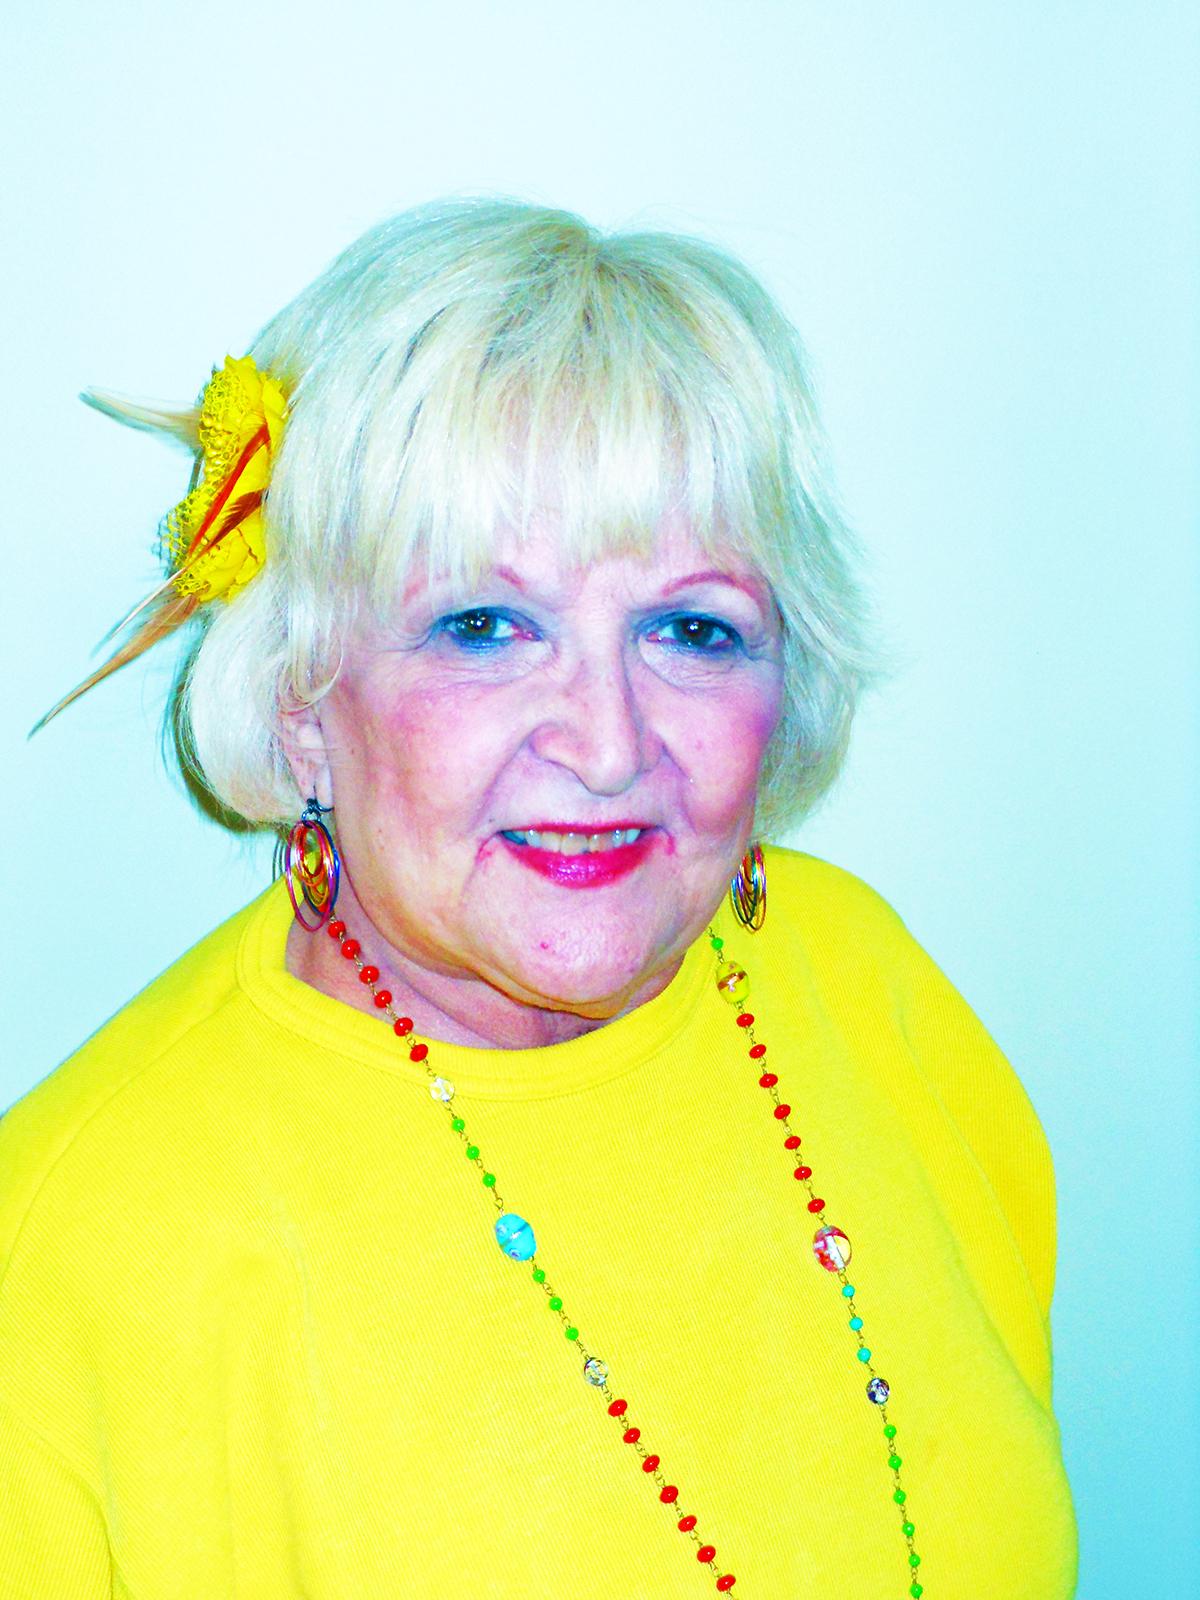 Brenda Allens Real Life Country Music Drama Took Her From Nebraska